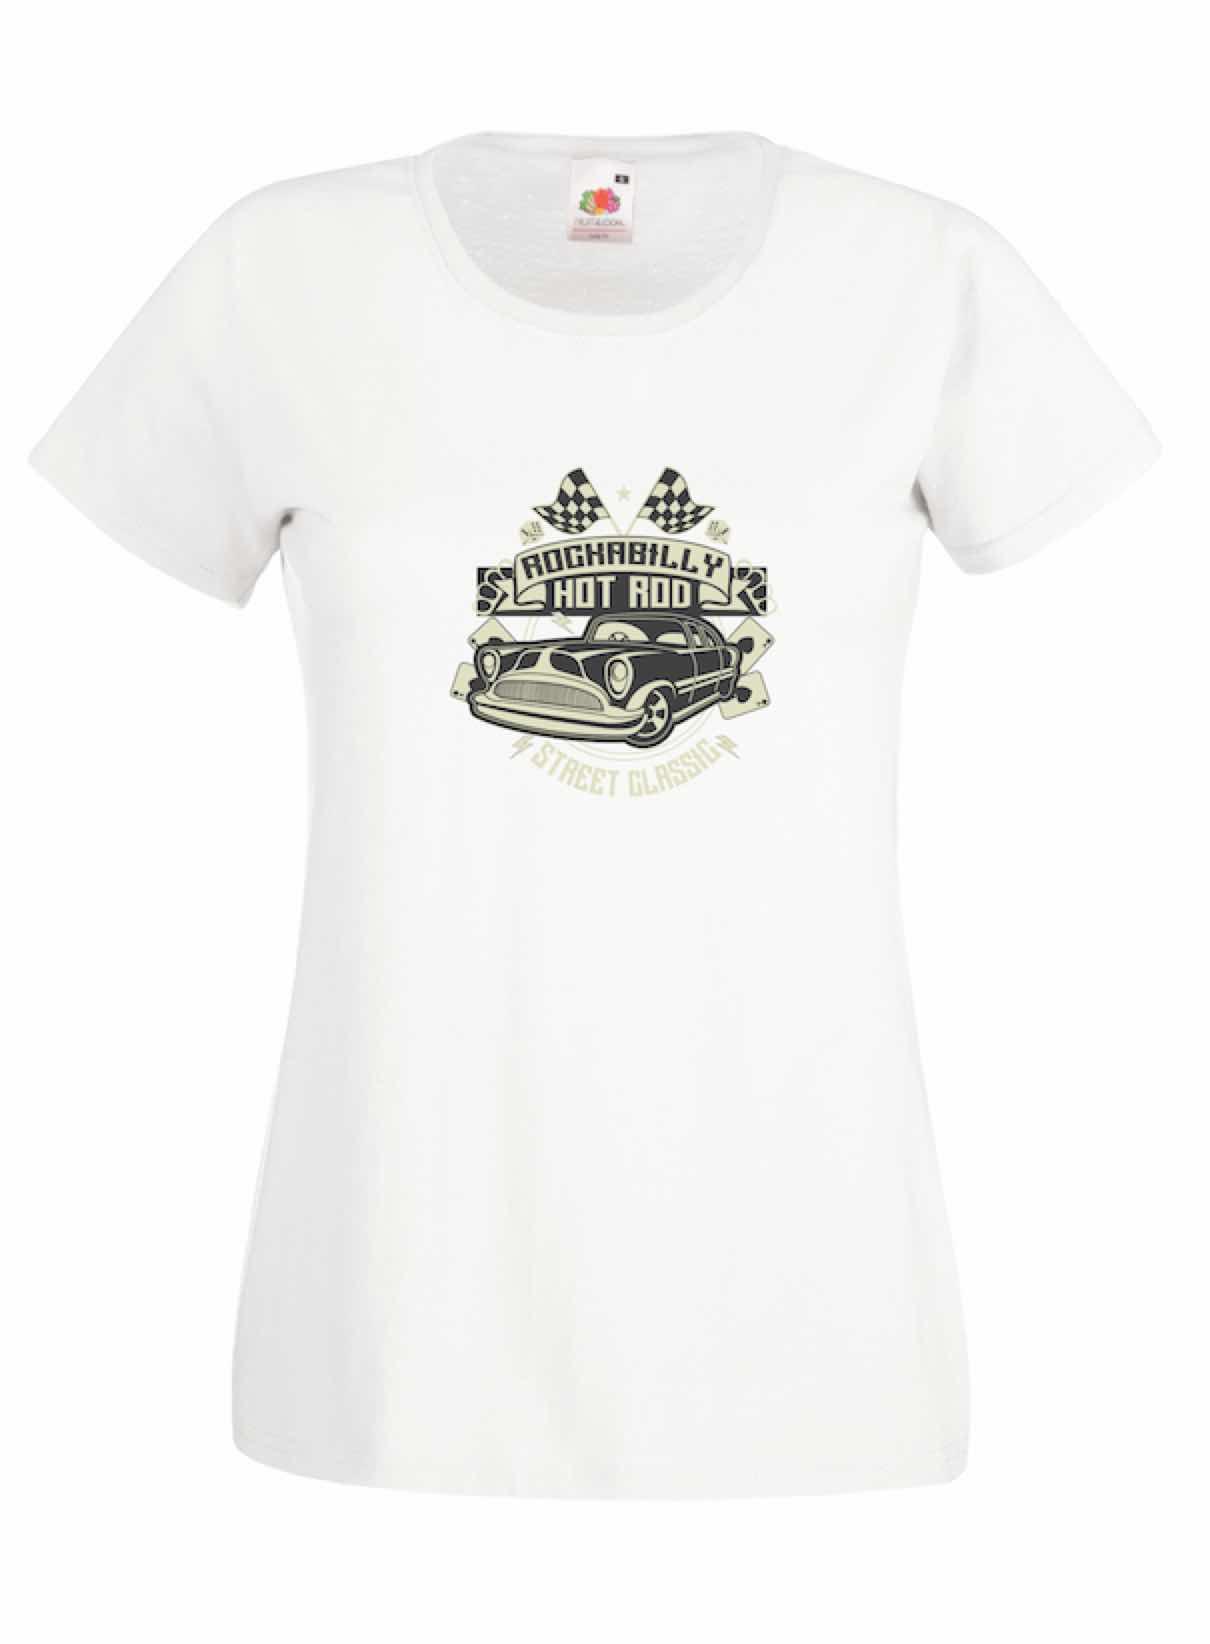 Rockabilly Hotrod design for t-shirt, hoodie & sweatshirt